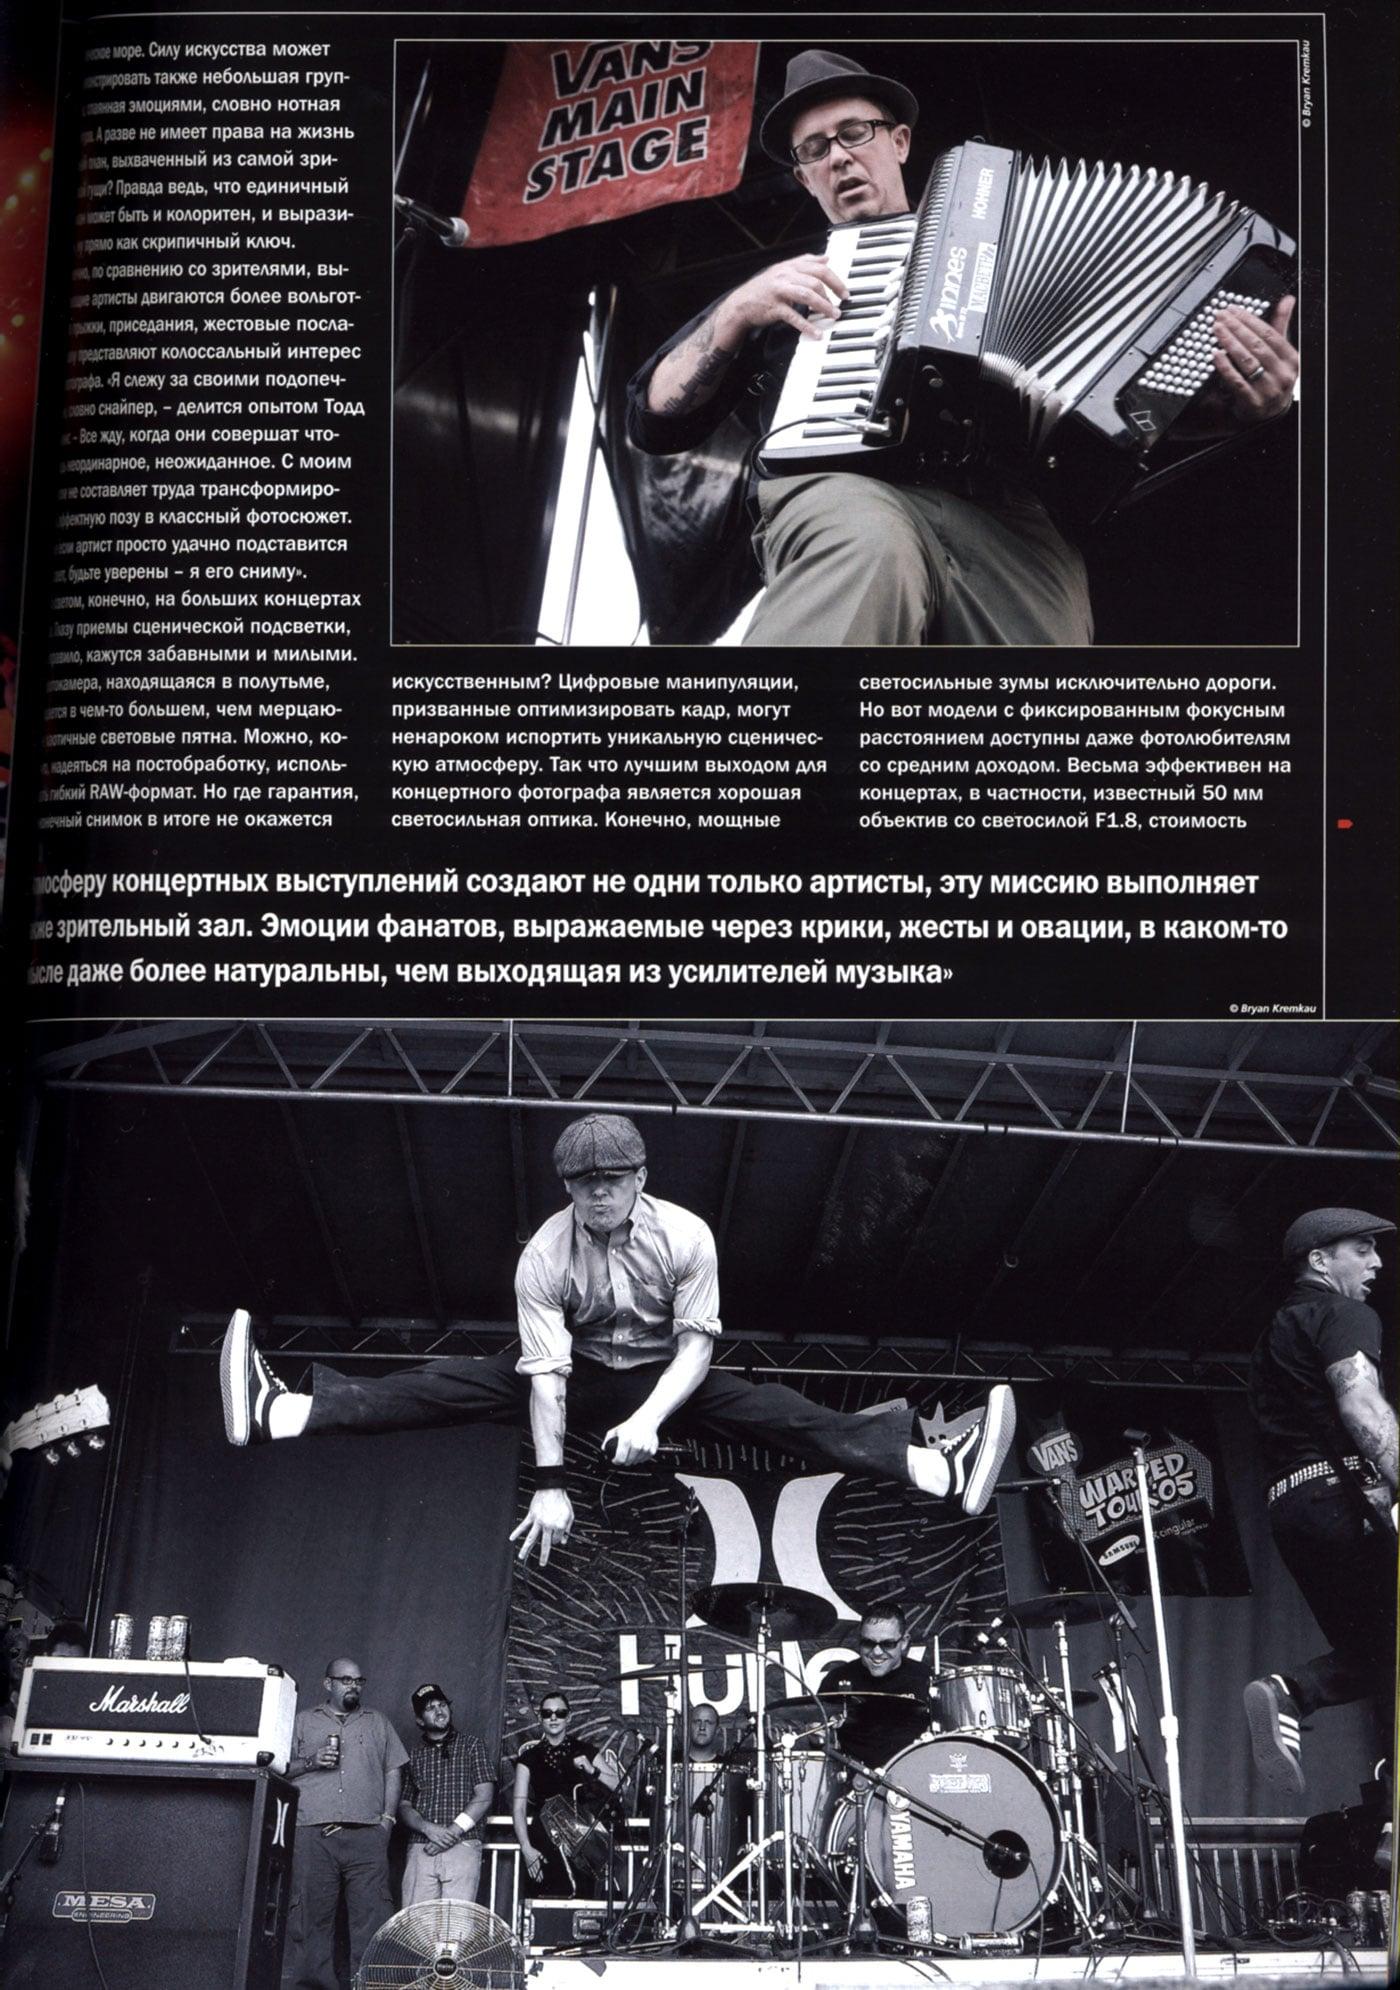 Photographer Magazine: Ukraine